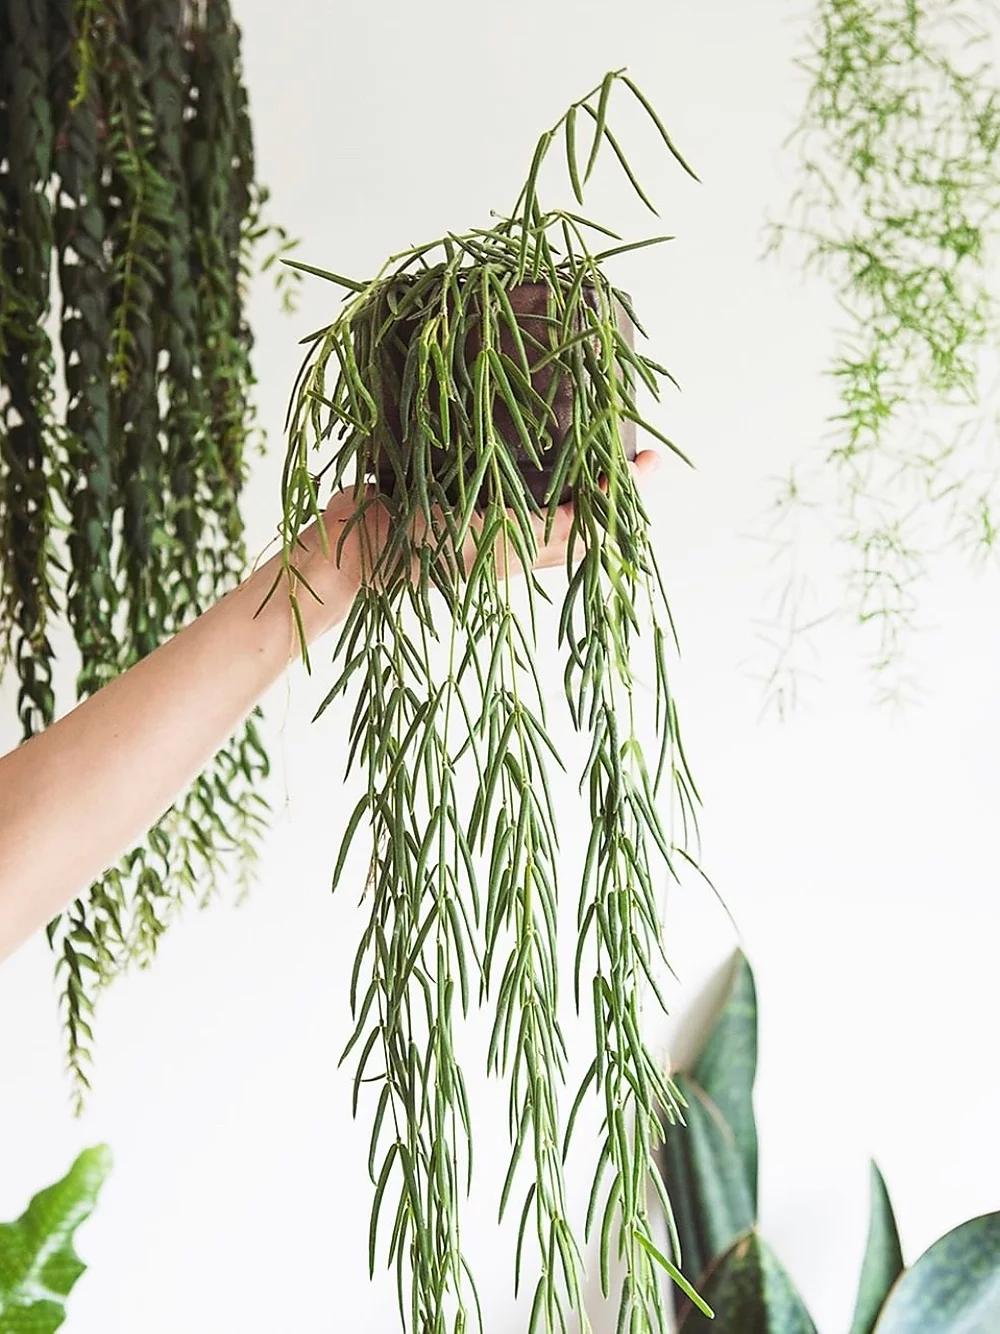 NEW Delivery VERY RARE Unique Houseplant Hoya Linearis